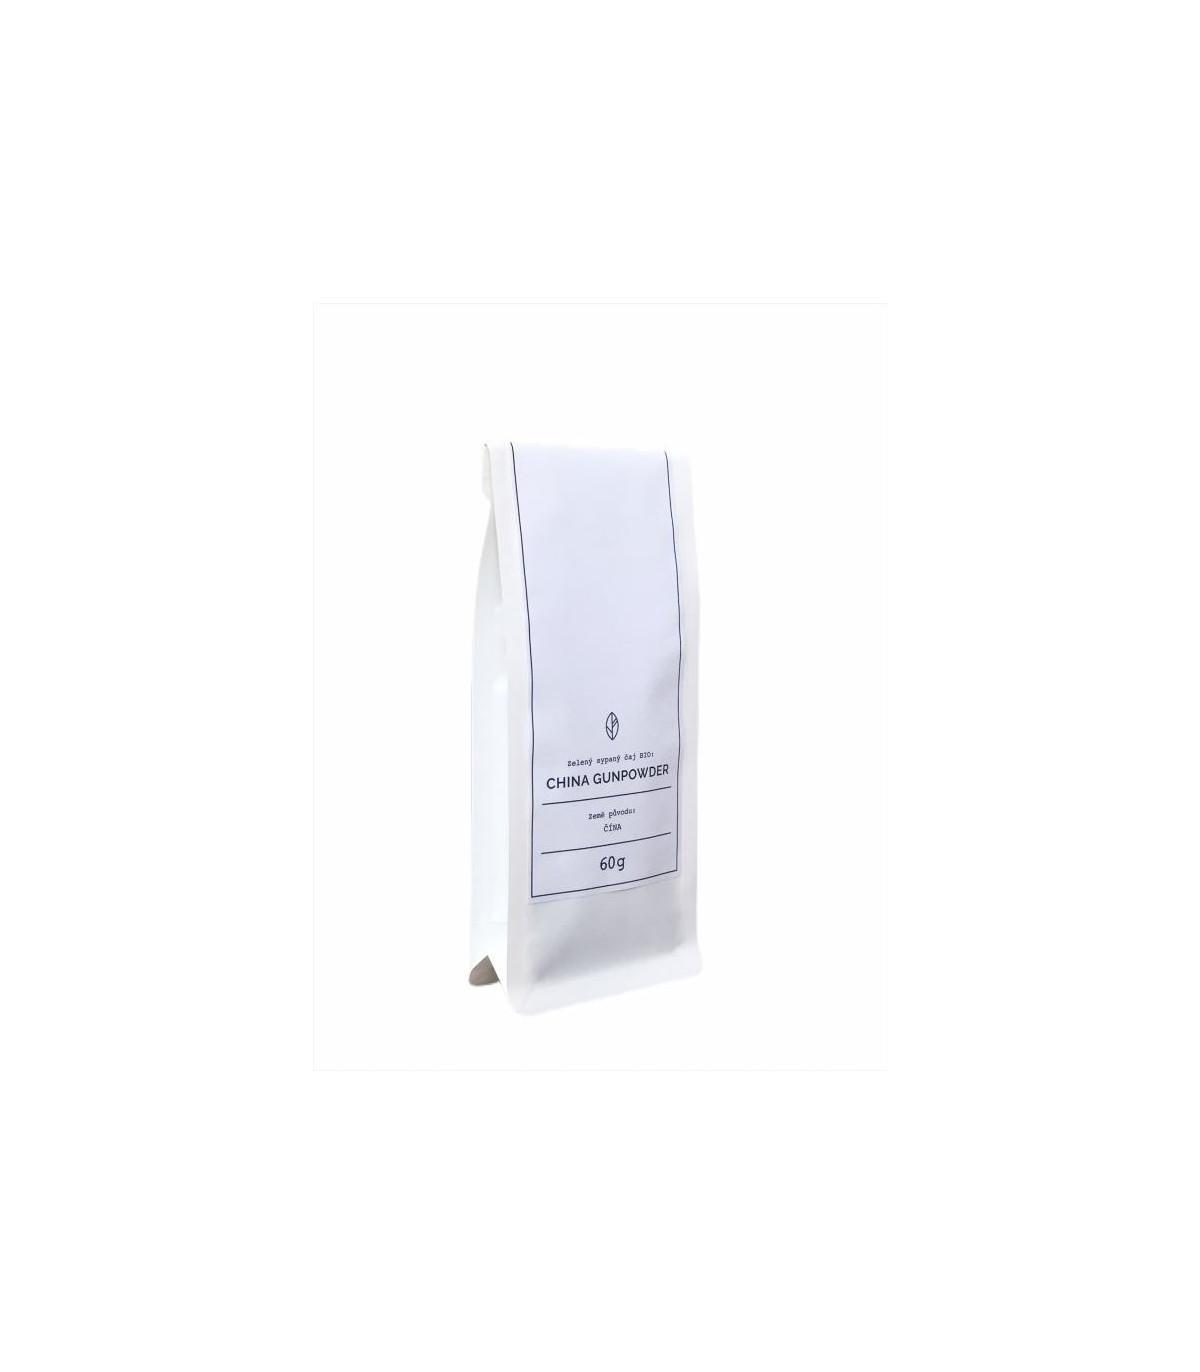 China Gunpowder Organic Tea - zelený čaj - BIO kvalita - 60 g